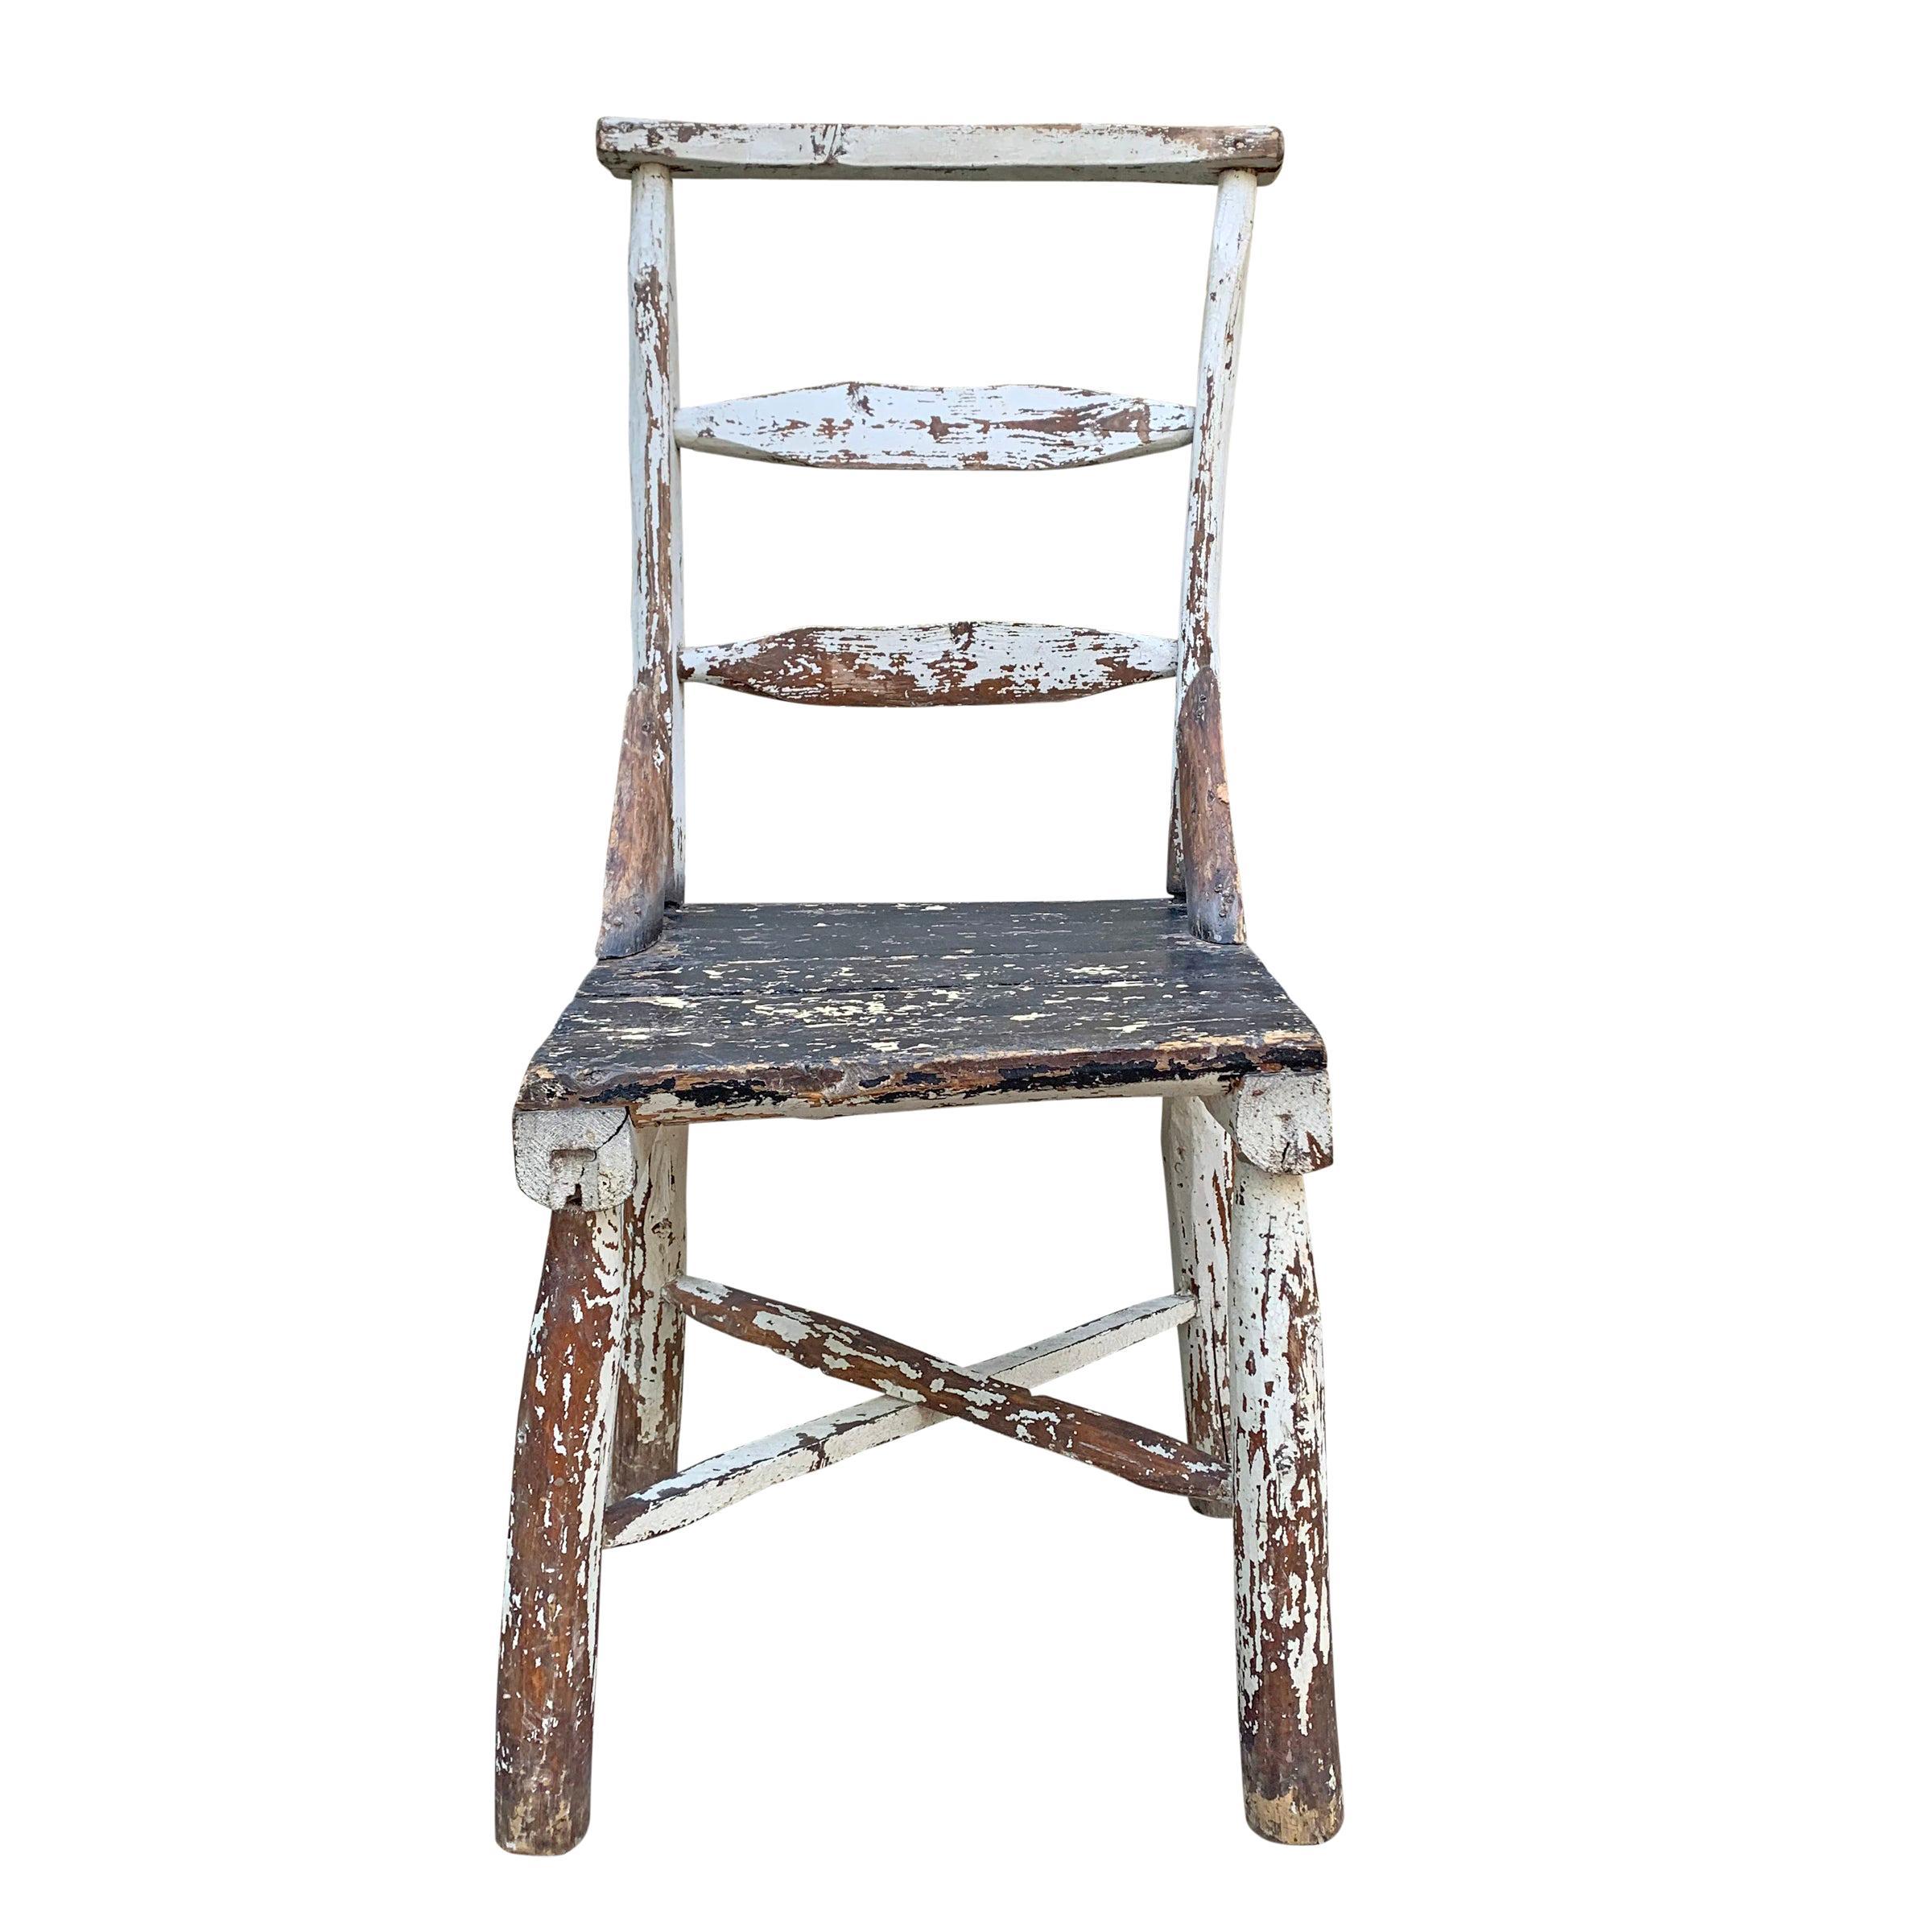 Early 20th Century American Adirondack Chair